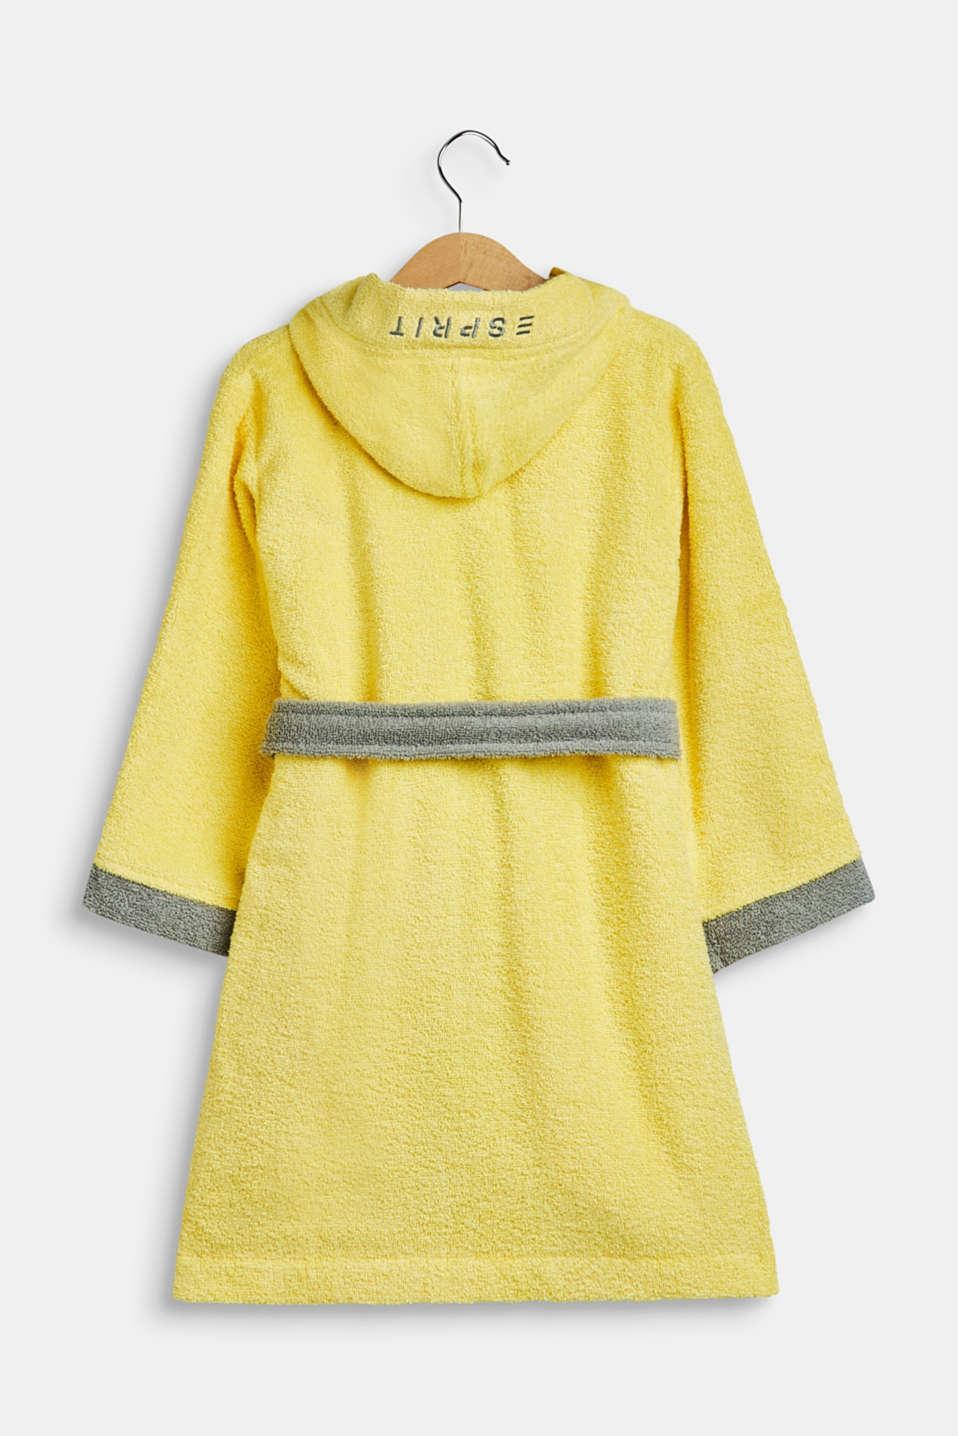 Children's bathrobe in 100% cotton, YELLOW/GREY, detail image number 1